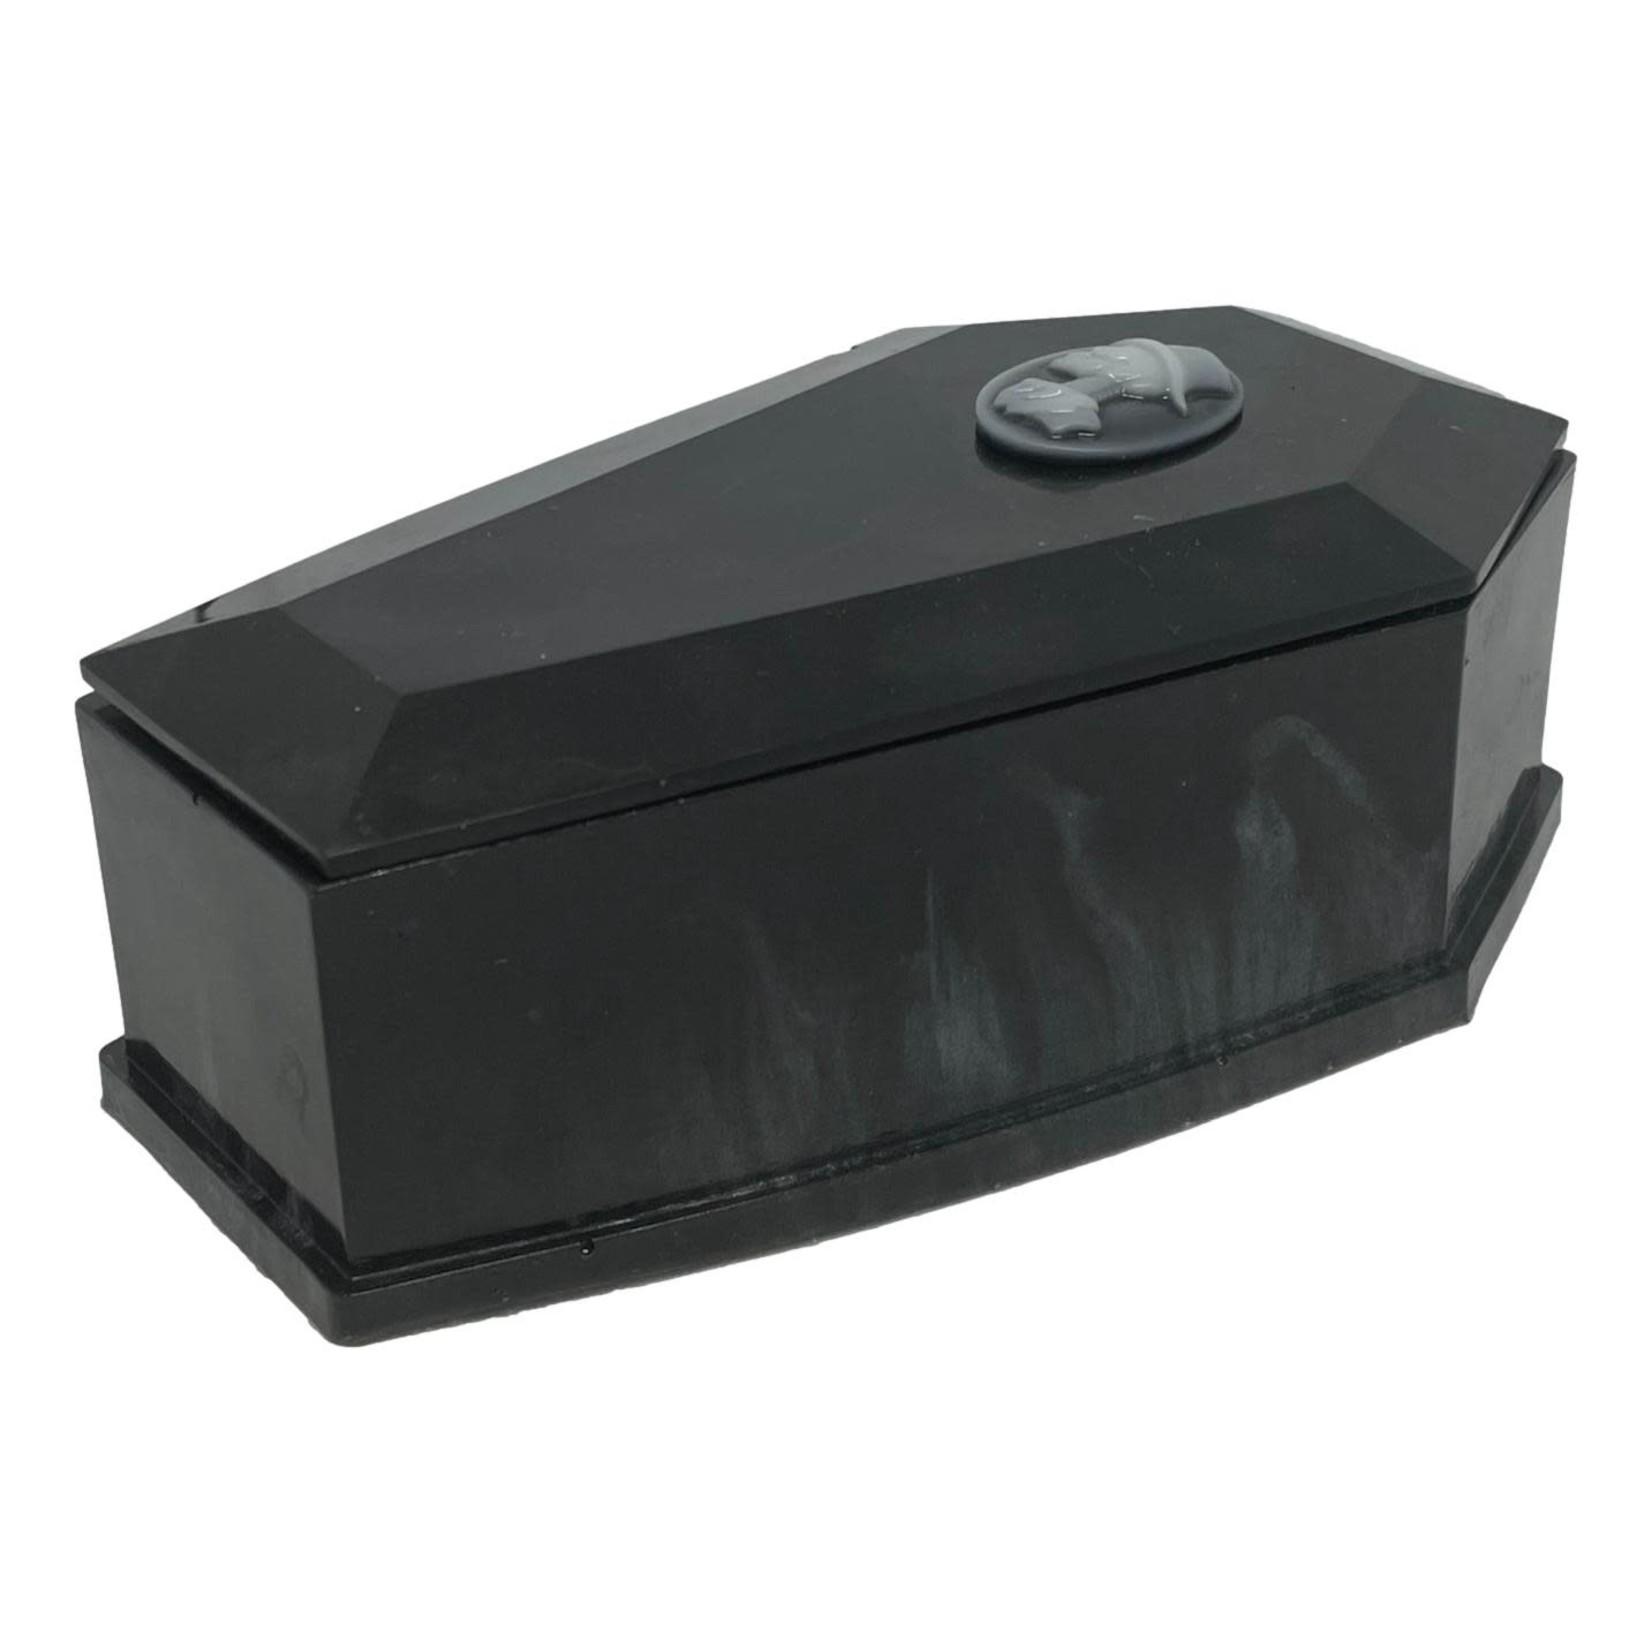 East Coast Sirens Black & Wispy Grey Coffin Trinket Box